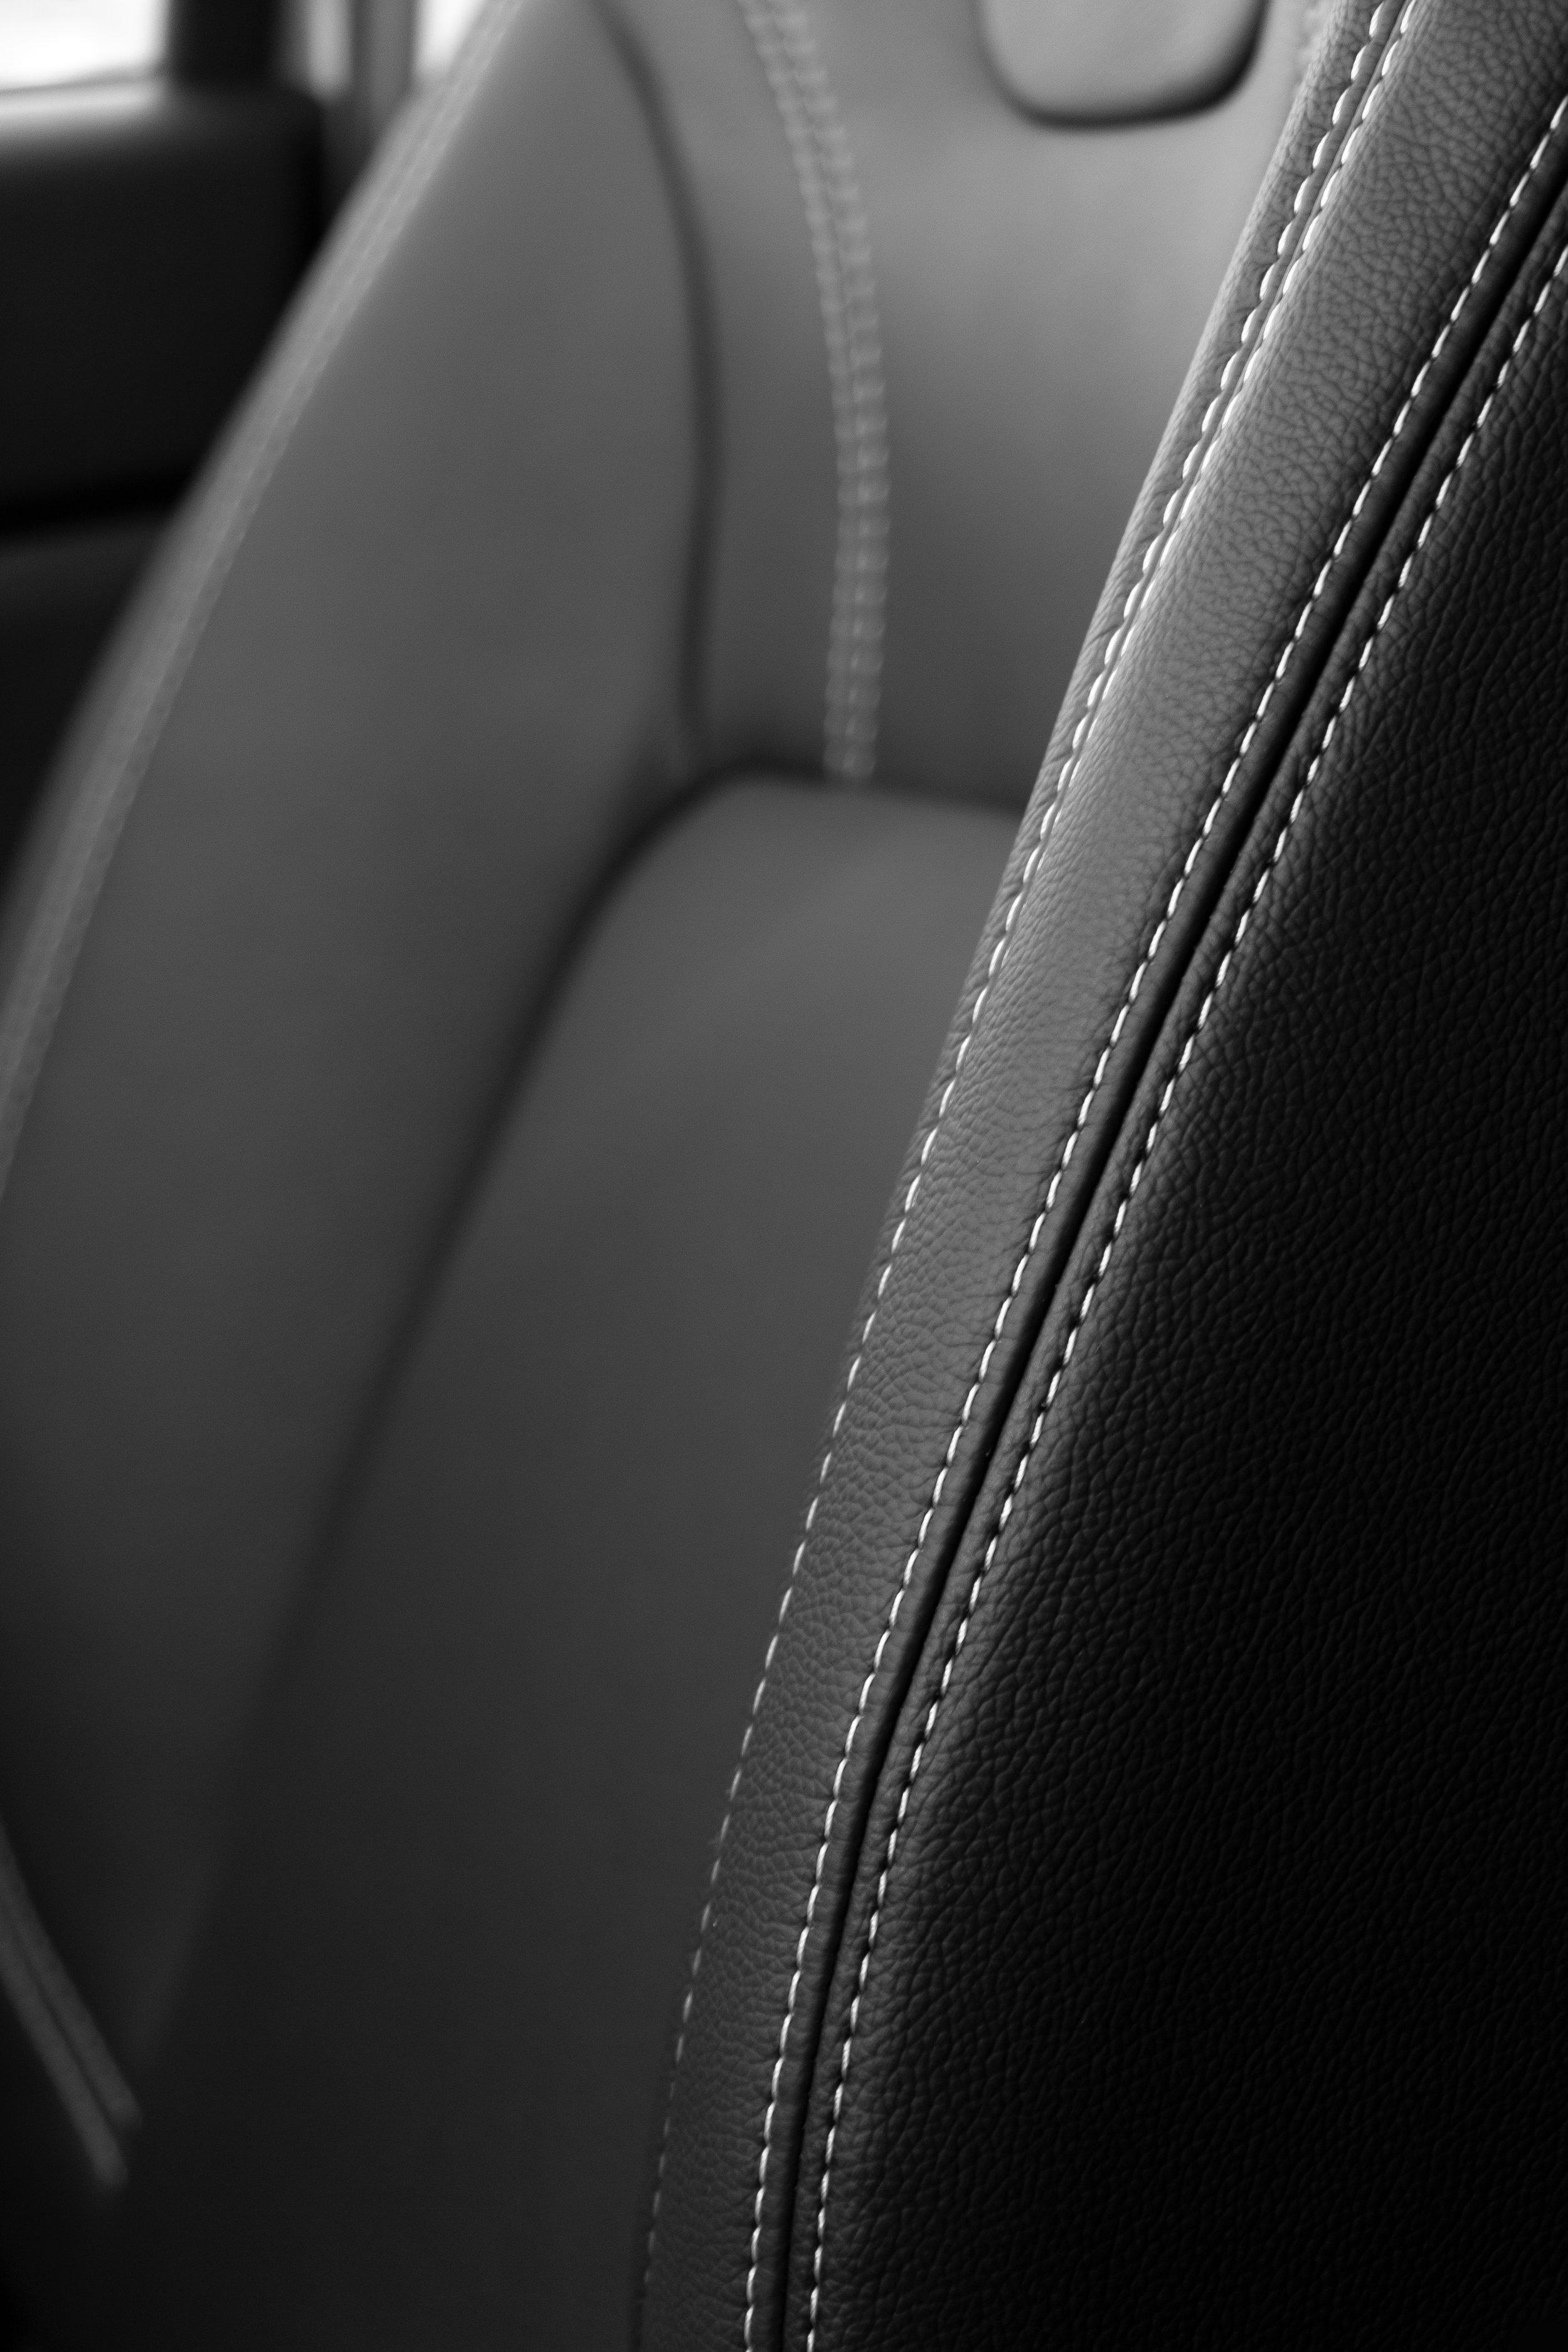 RVE-Nissan-Navara-Leather-Close-Up-Stitching.jpg